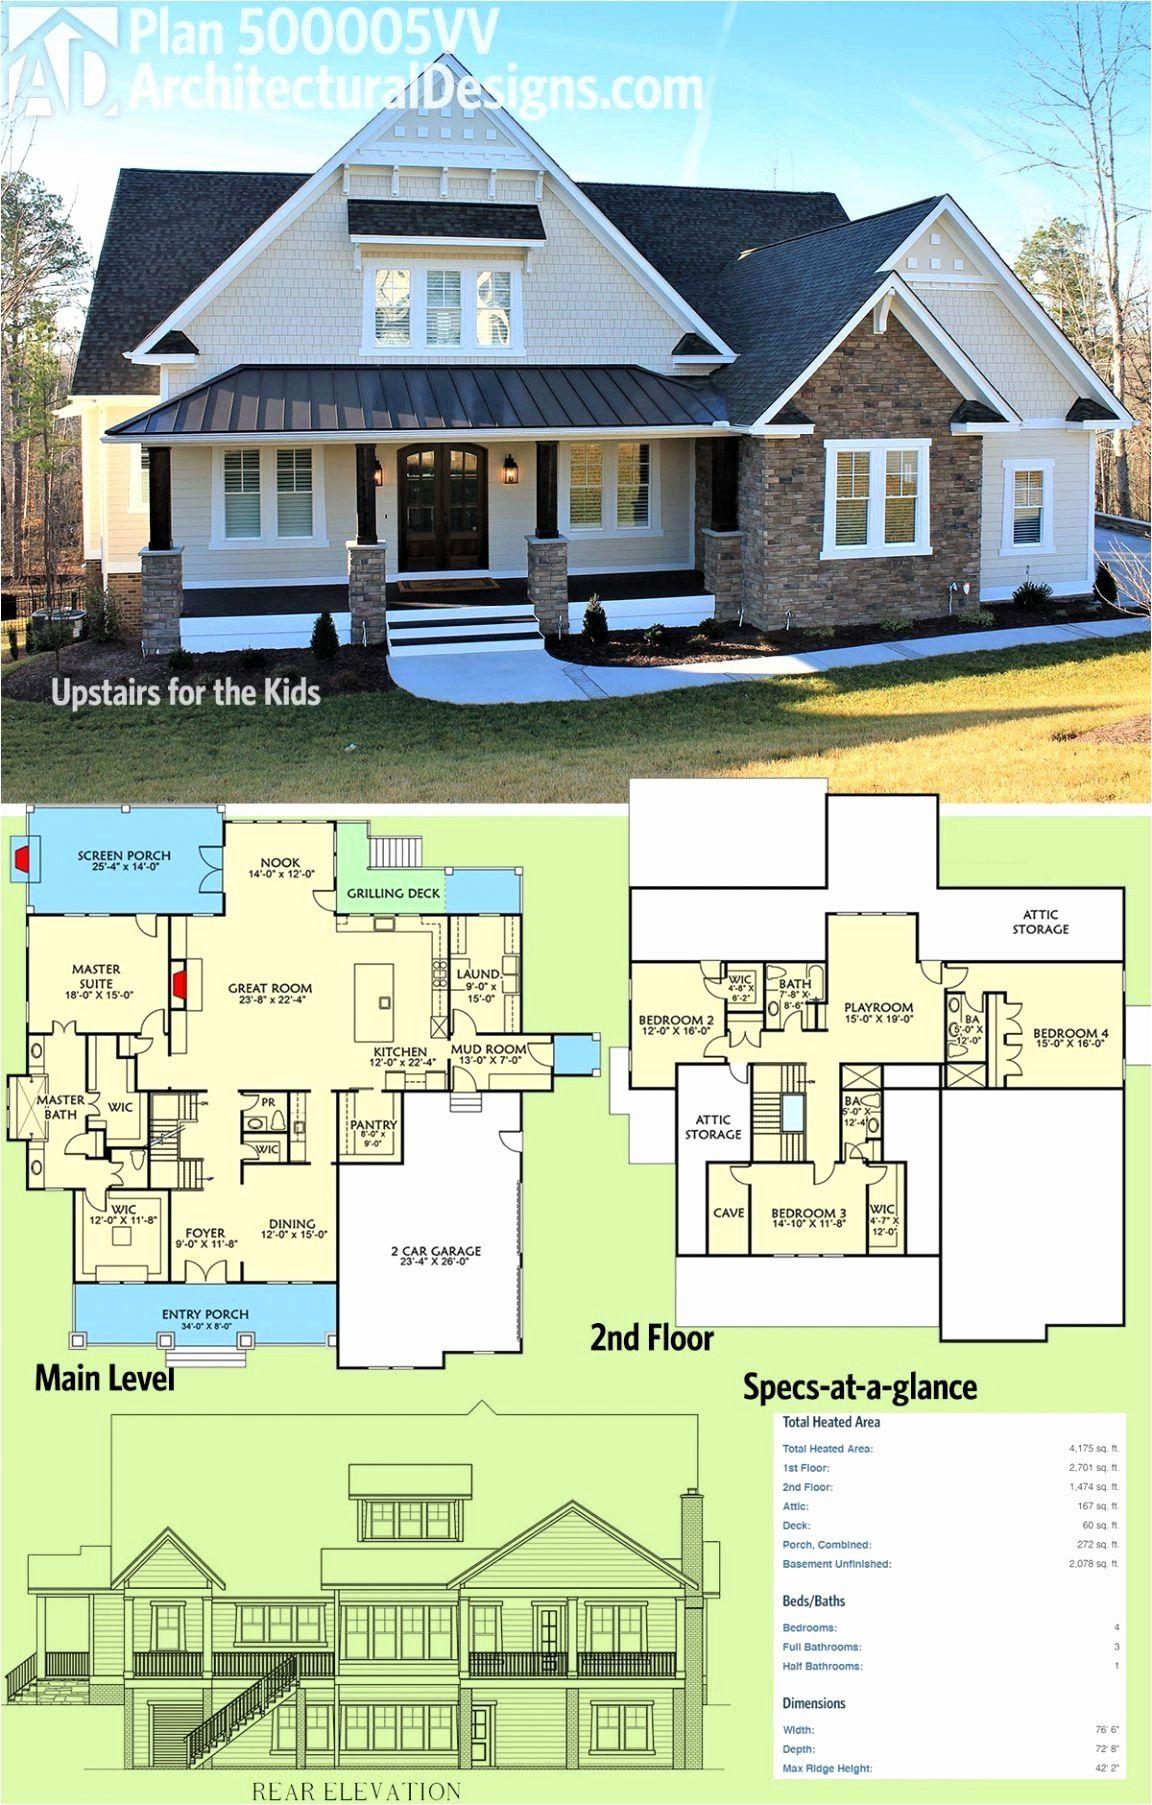 House Plans Under 200k Pesos Check More At Https Bradshomefurnishings Com House Plans Under 200k Architectural Design House Plans House Plans Farmhouse Plans